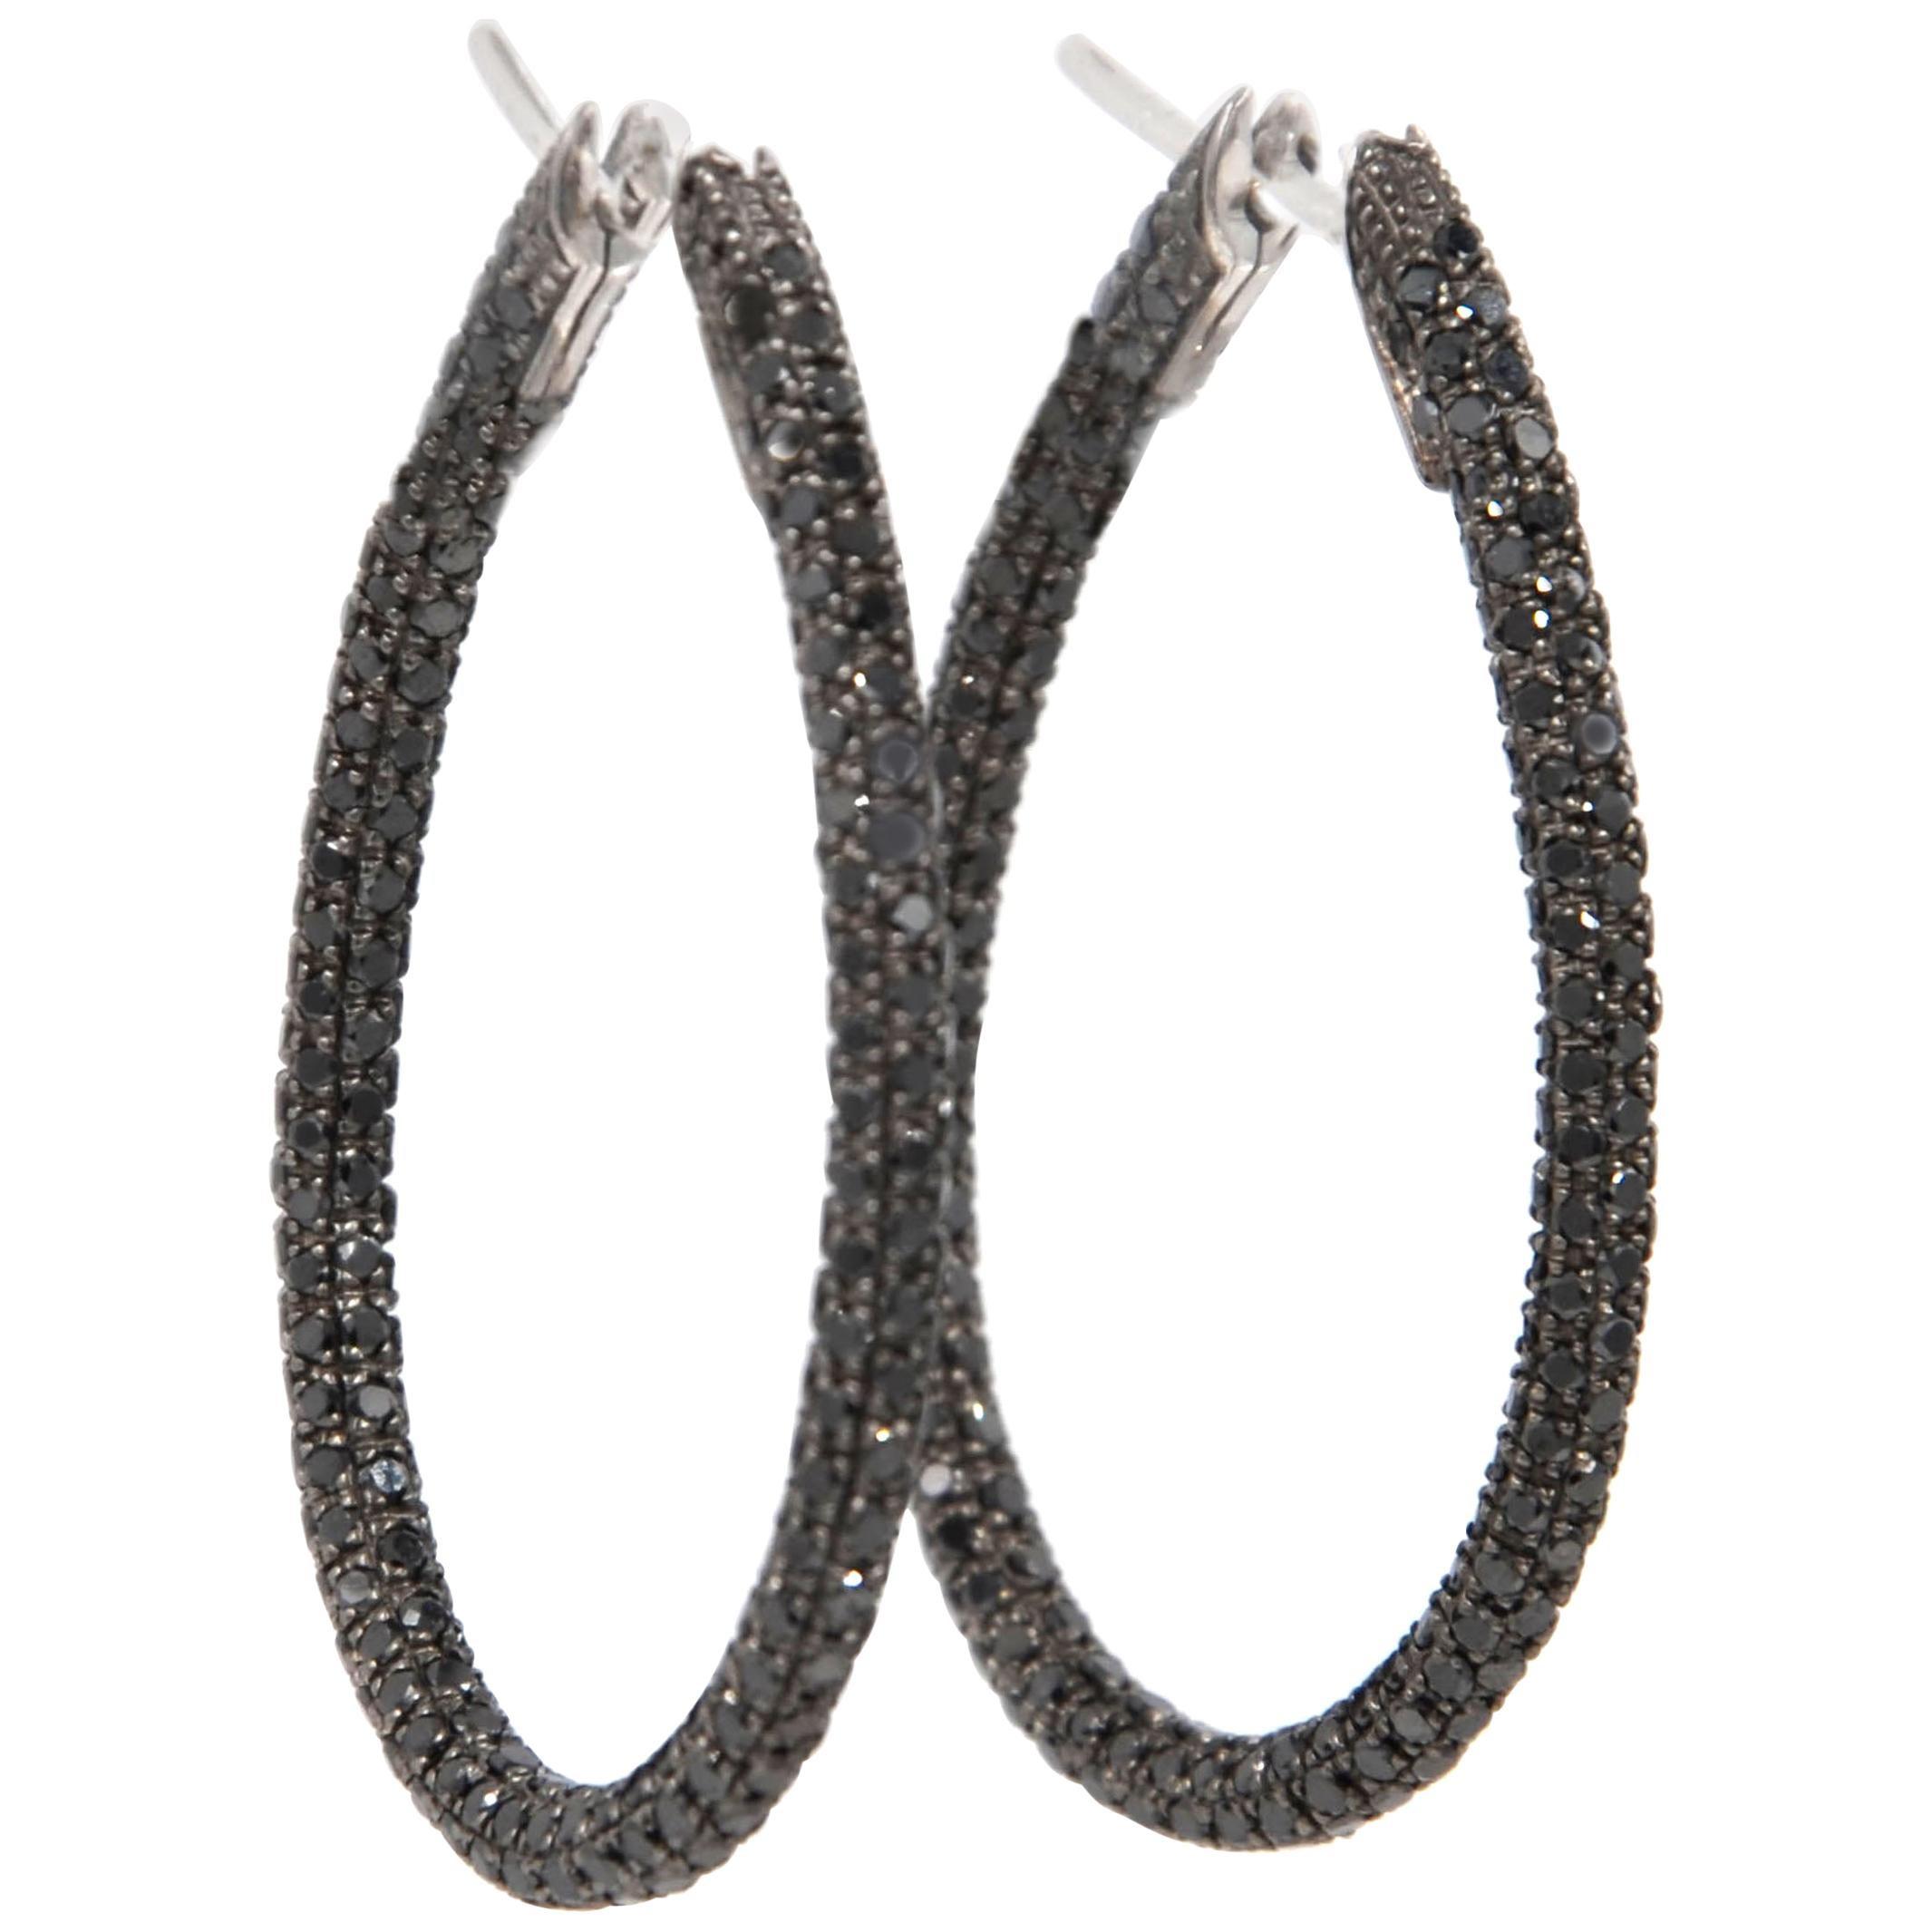 Garavelli 18 Karat White Gold Black Diamonds Stilish Large Drop Hoops Earrings